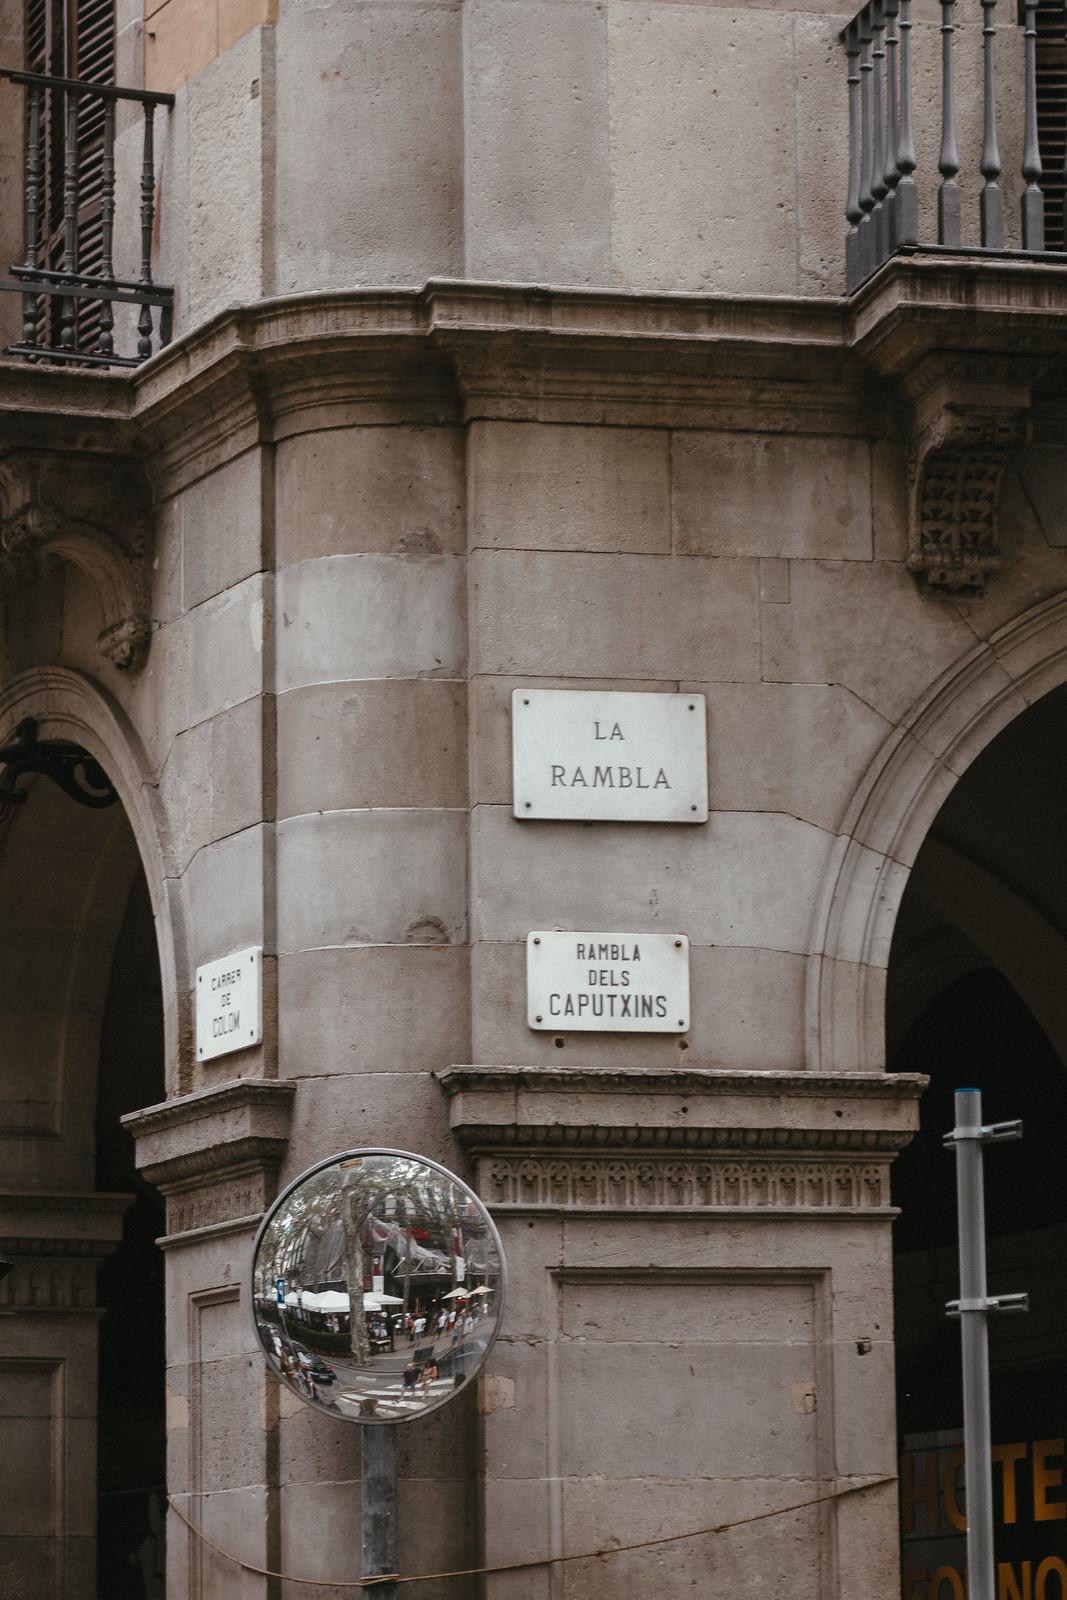 Places To Visit In Barcelona: La Rambla